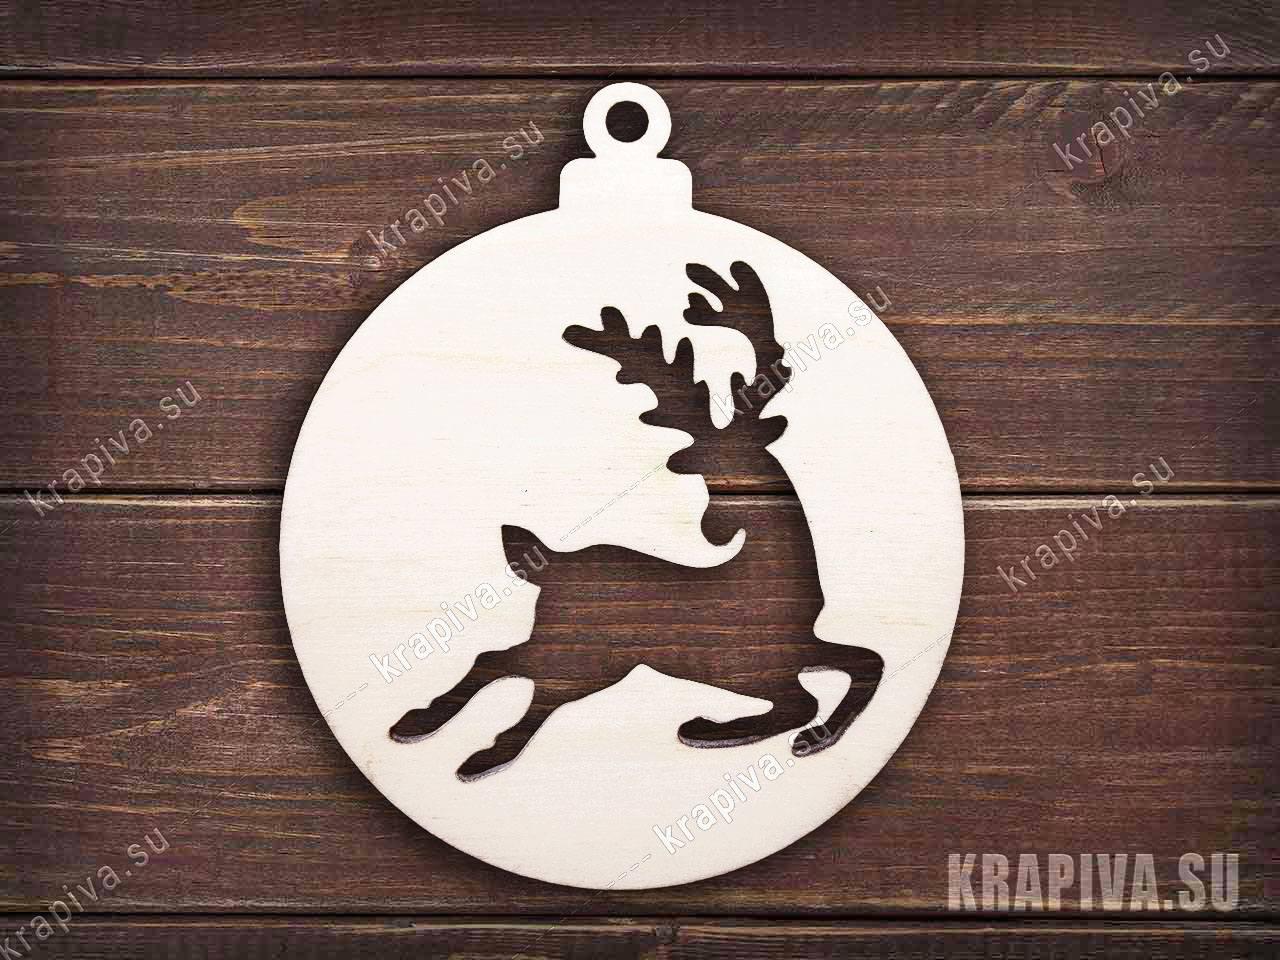 Заготовка елочной игрушки шар с оленем №1 за 30 руб. в магазине Крапива (krapiva.su) (фото)